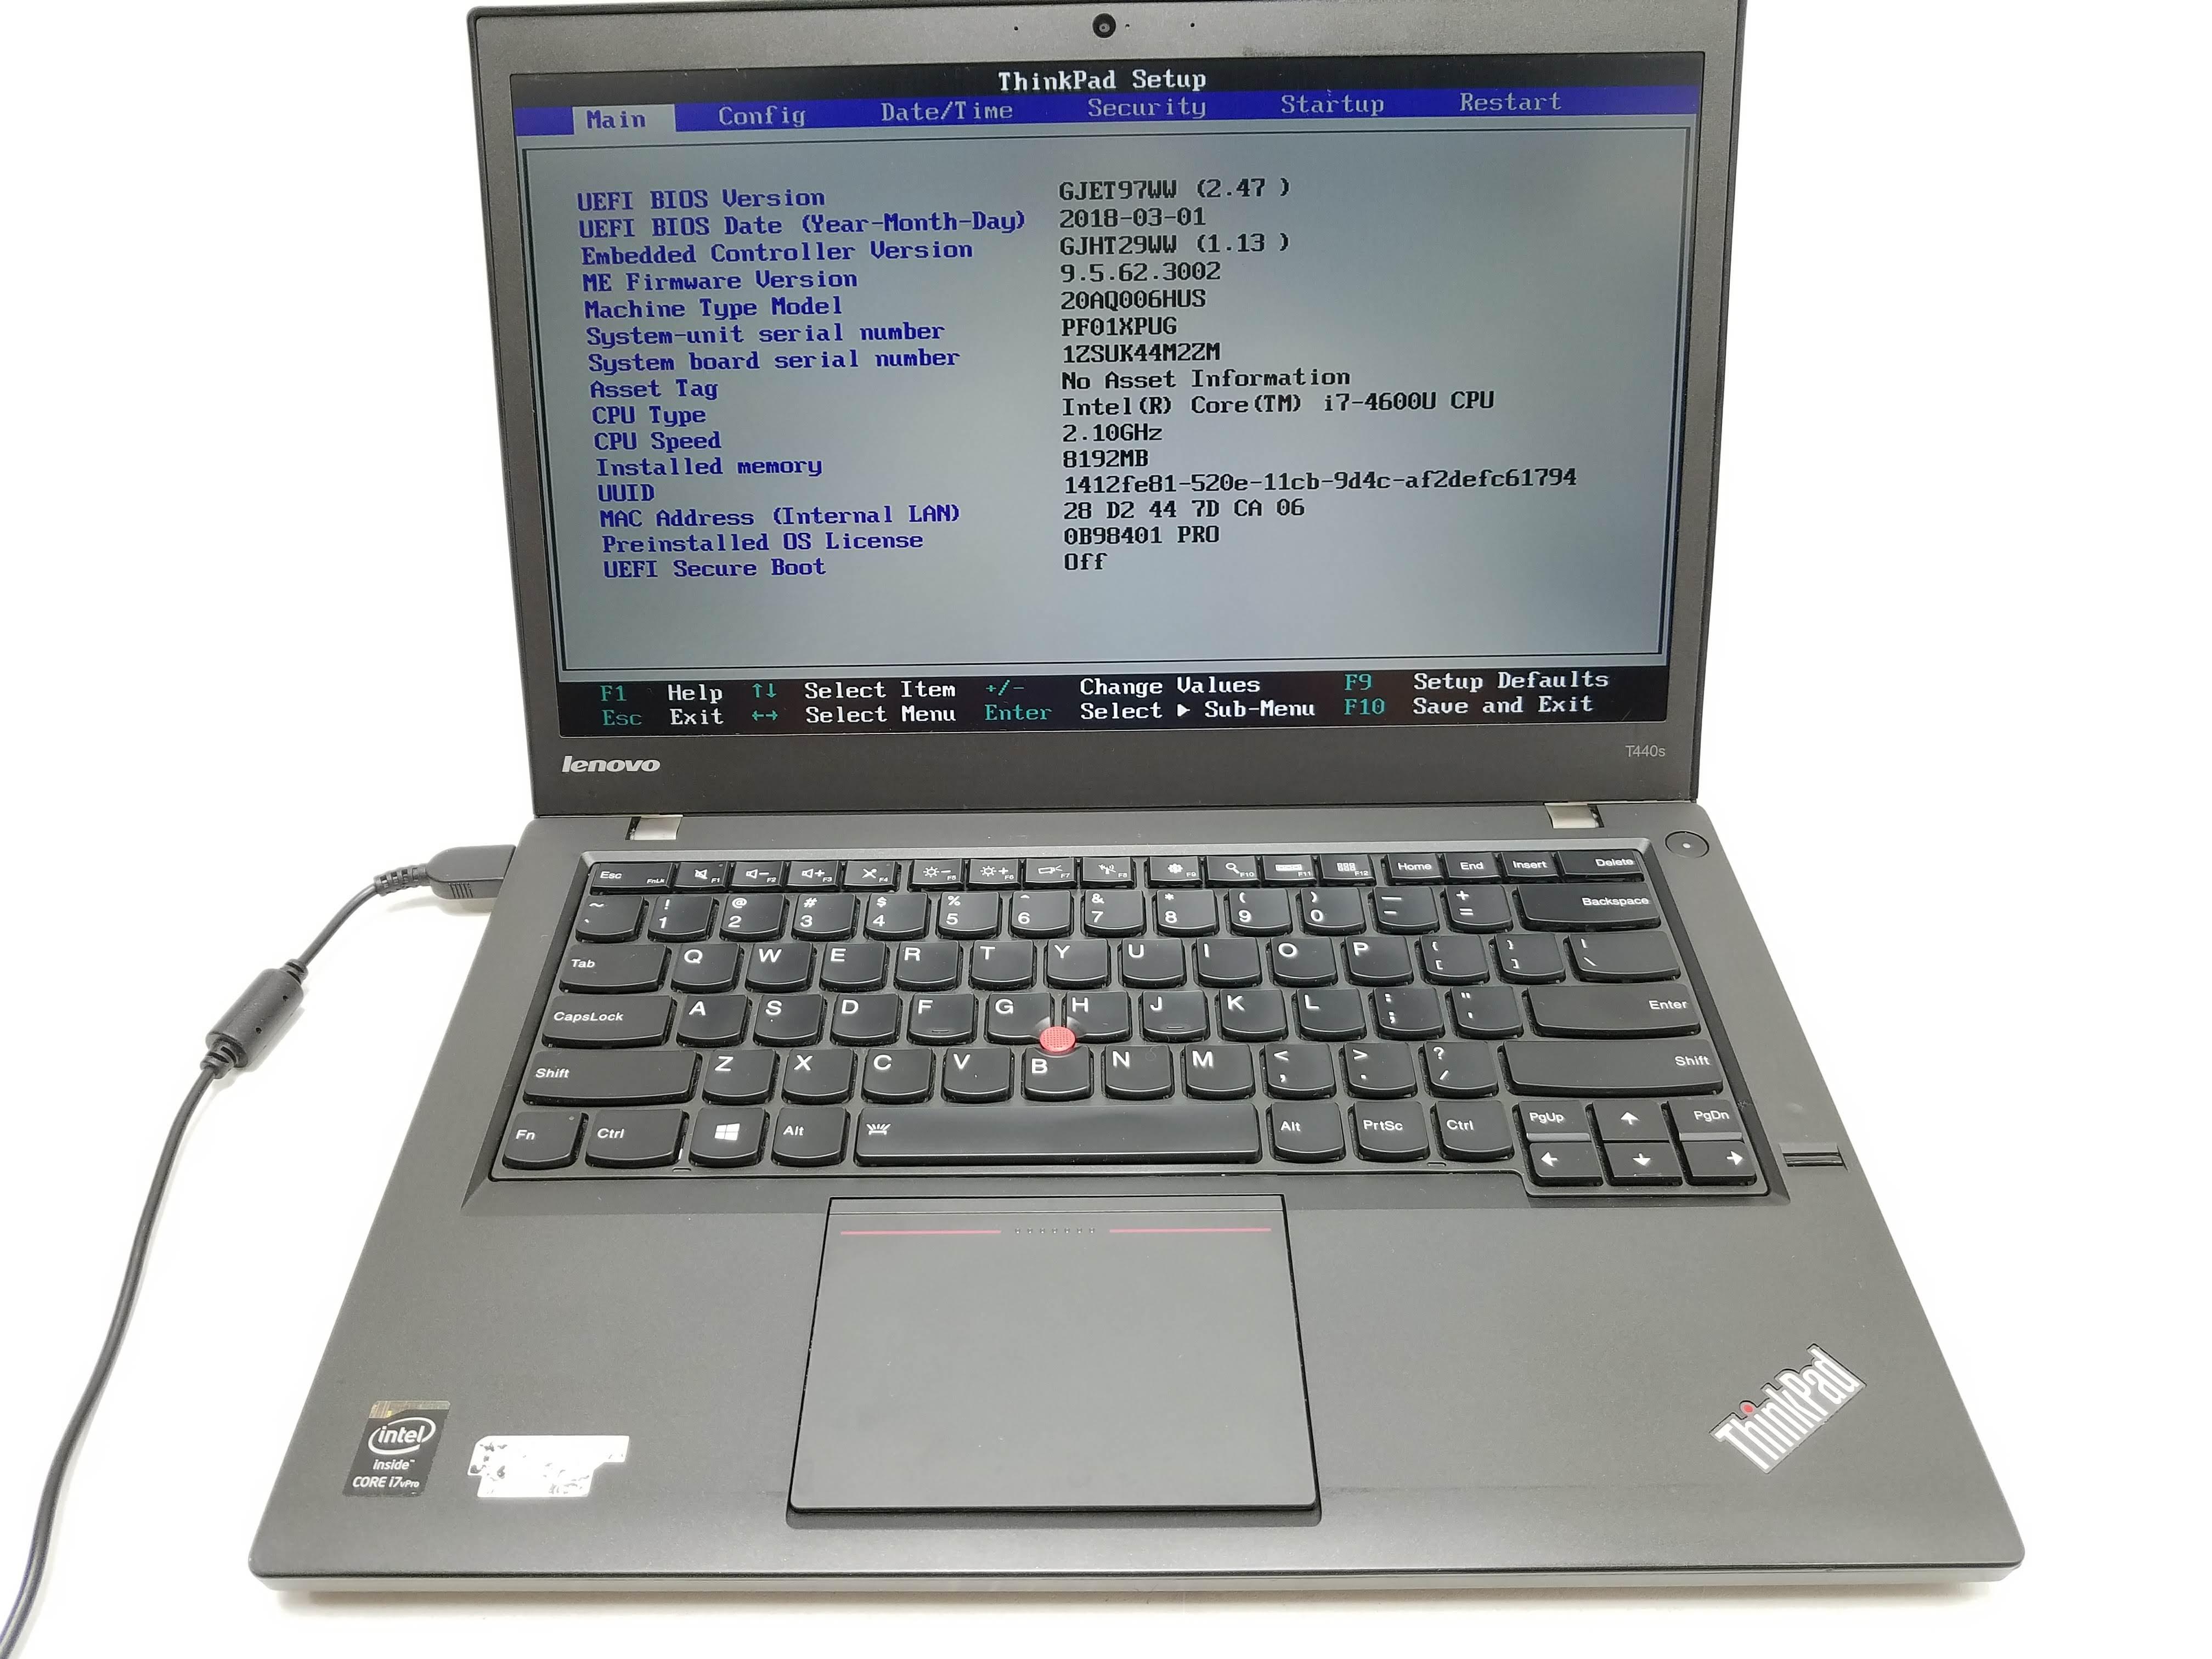 Details about Lenovo ThinkPad T440s i7-4600U 2 1GHz 8GB 256GB SSD 15 6